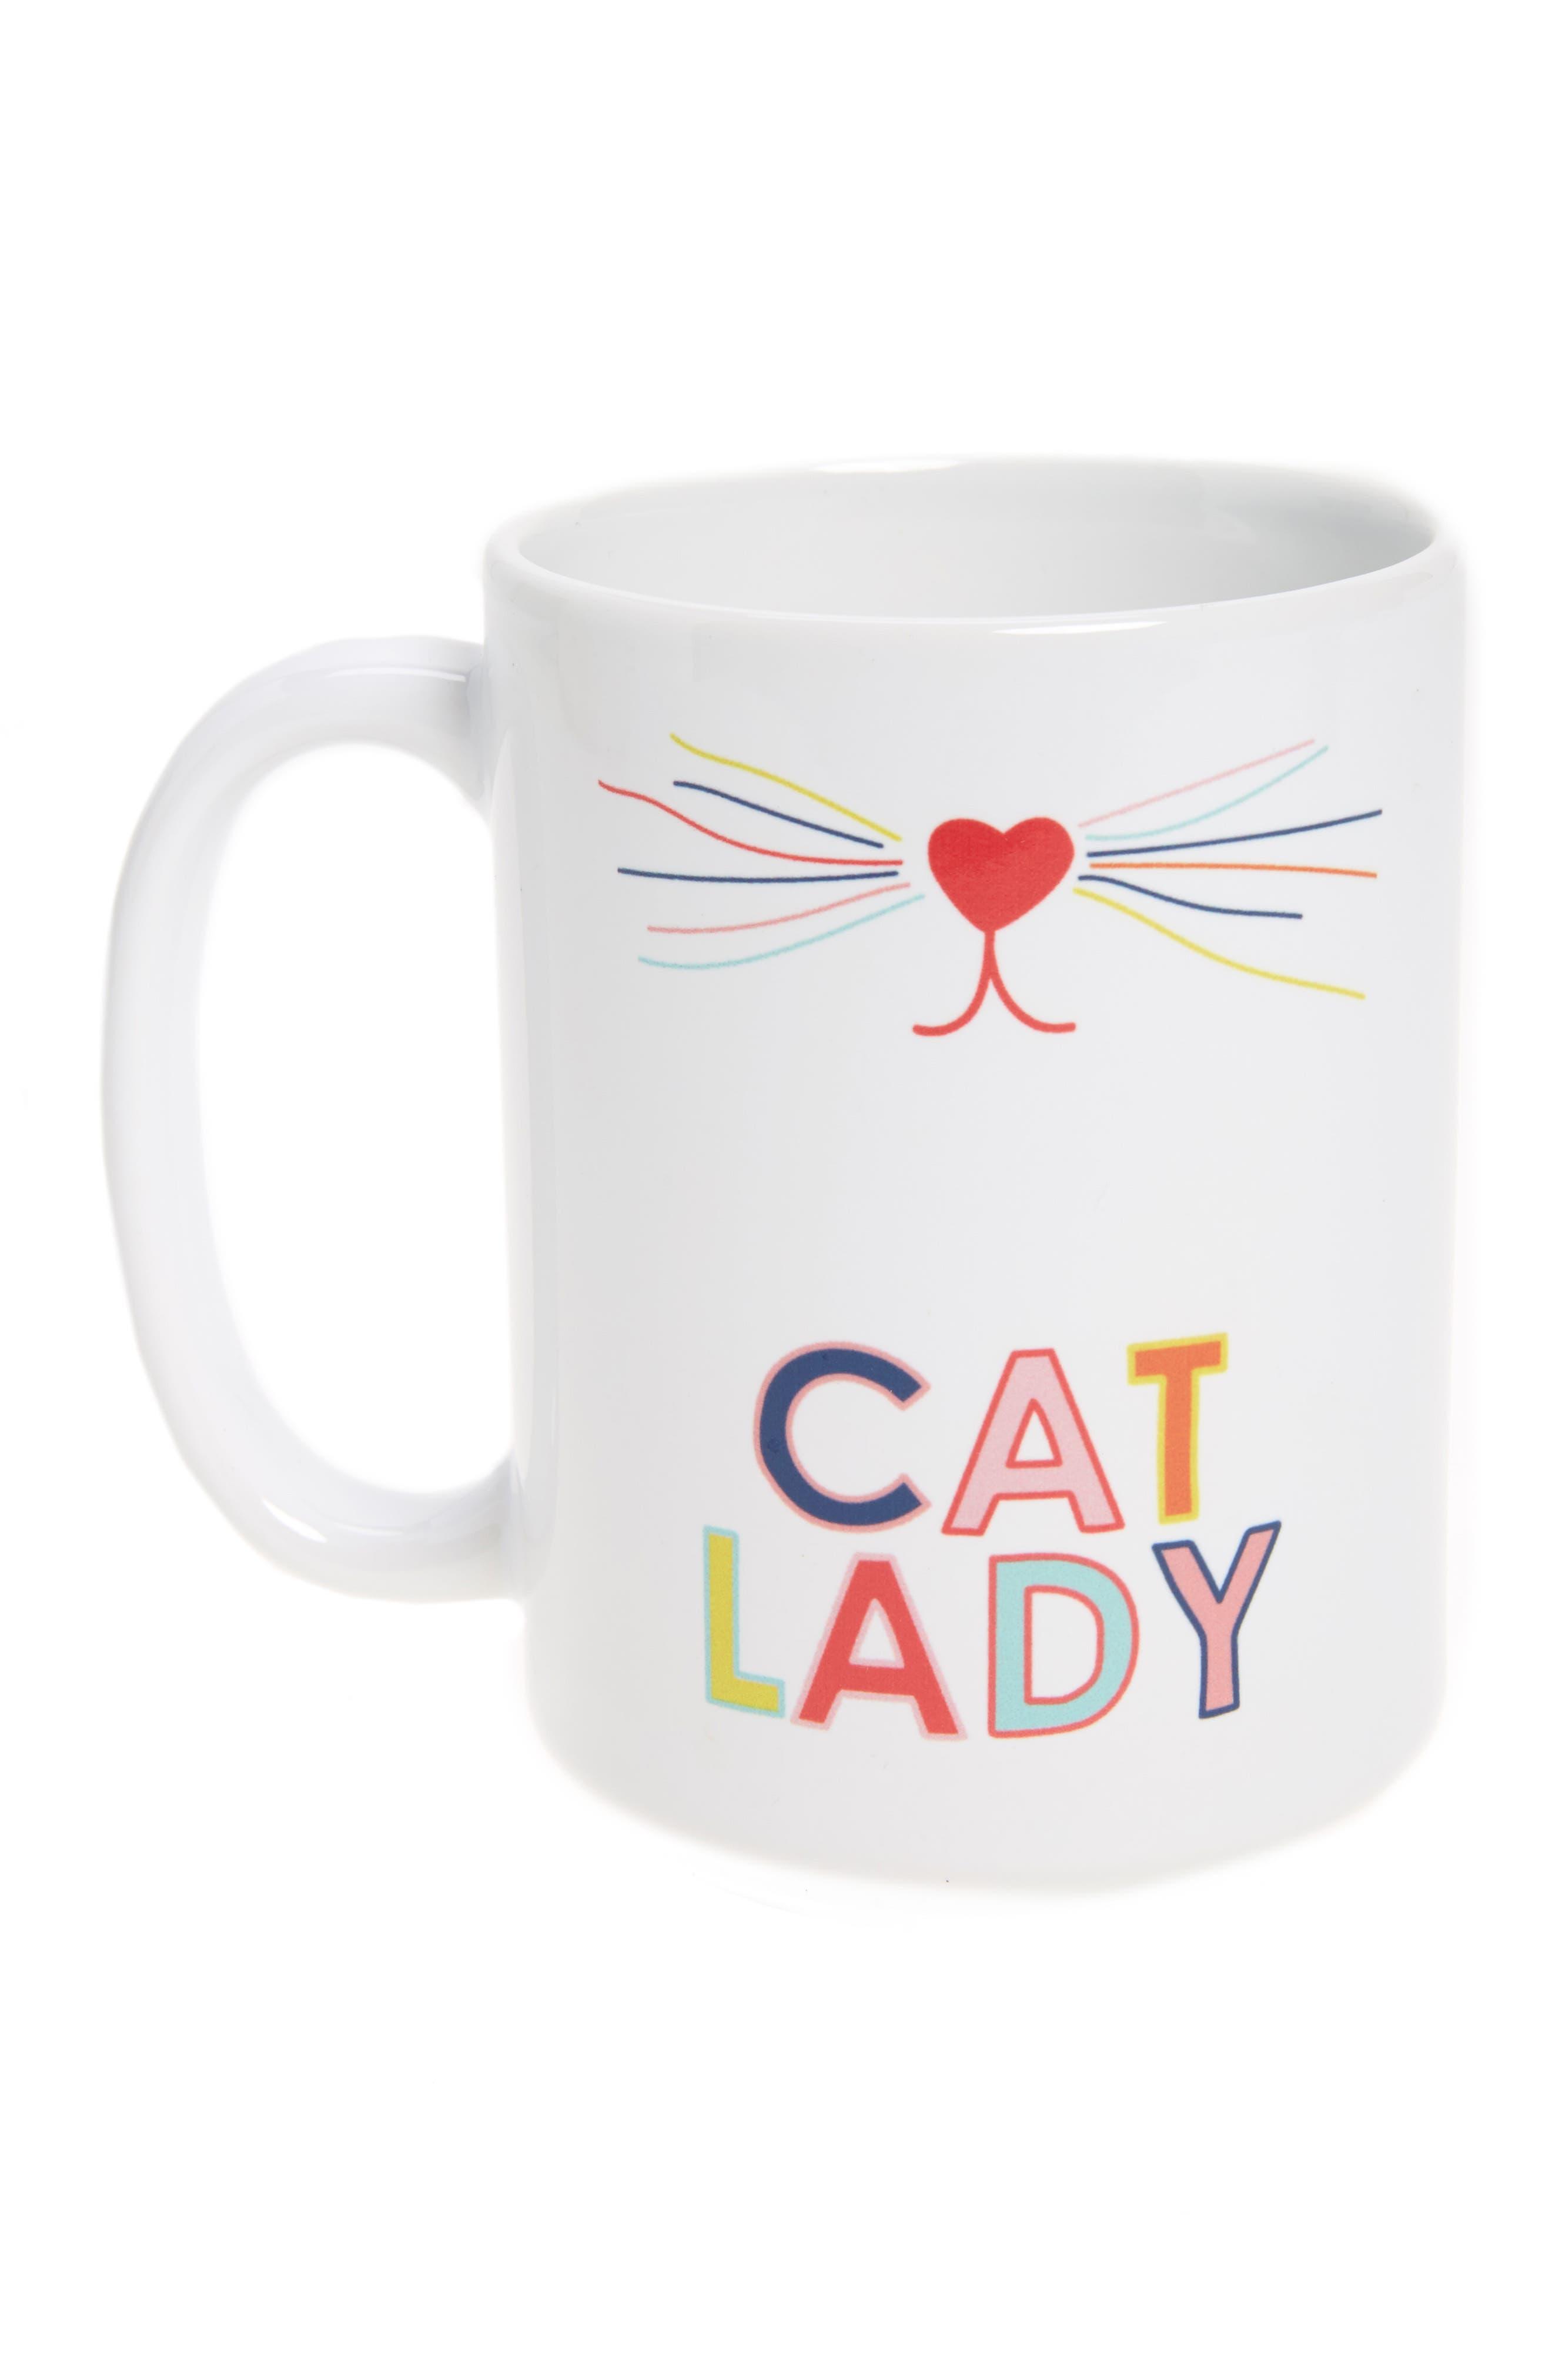 Toss Designs Cat Lady Mug